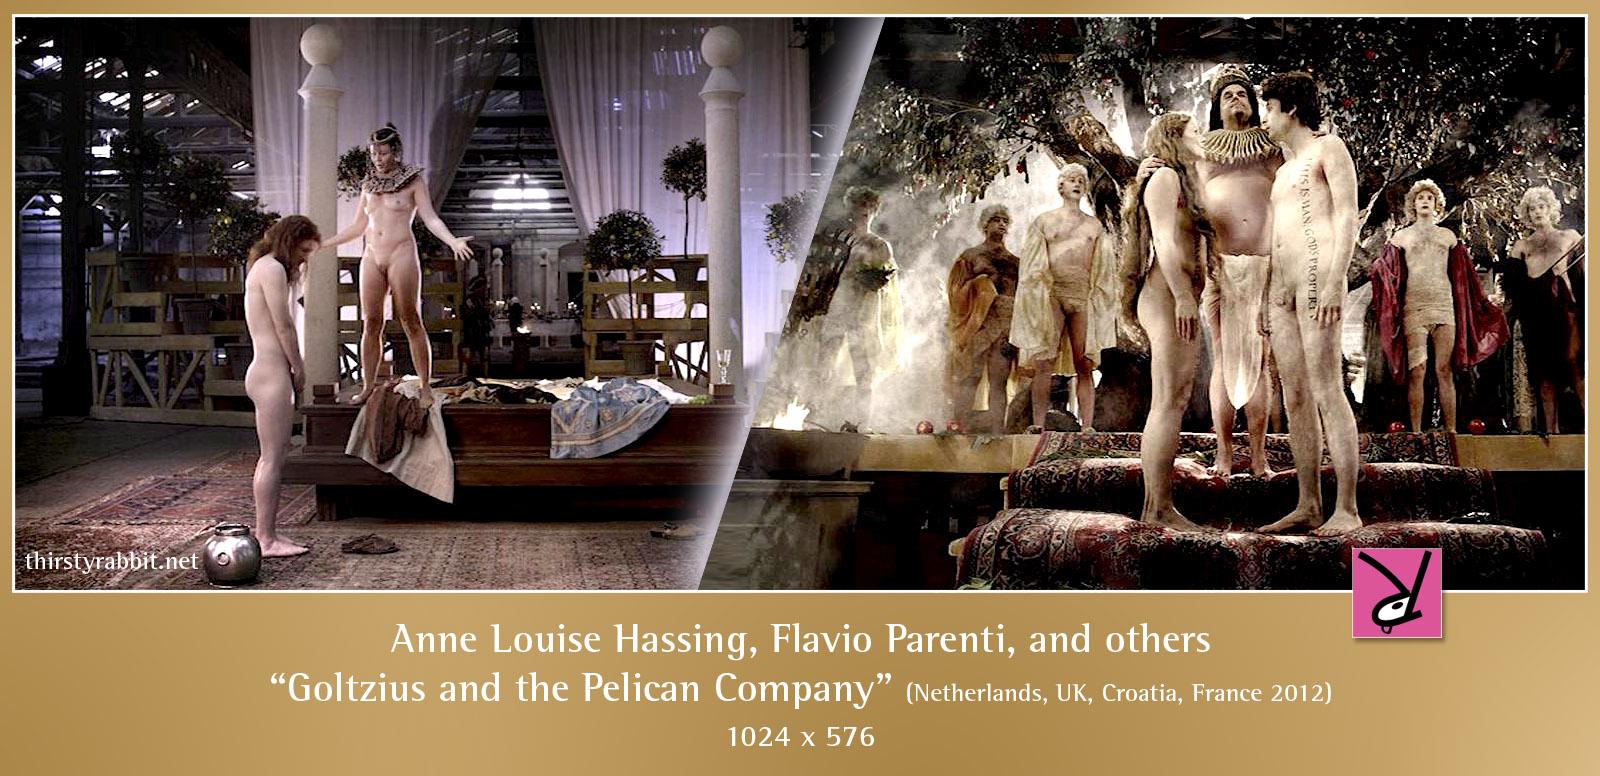 Halina reijn nude goltzius and the pelican company - 2 8